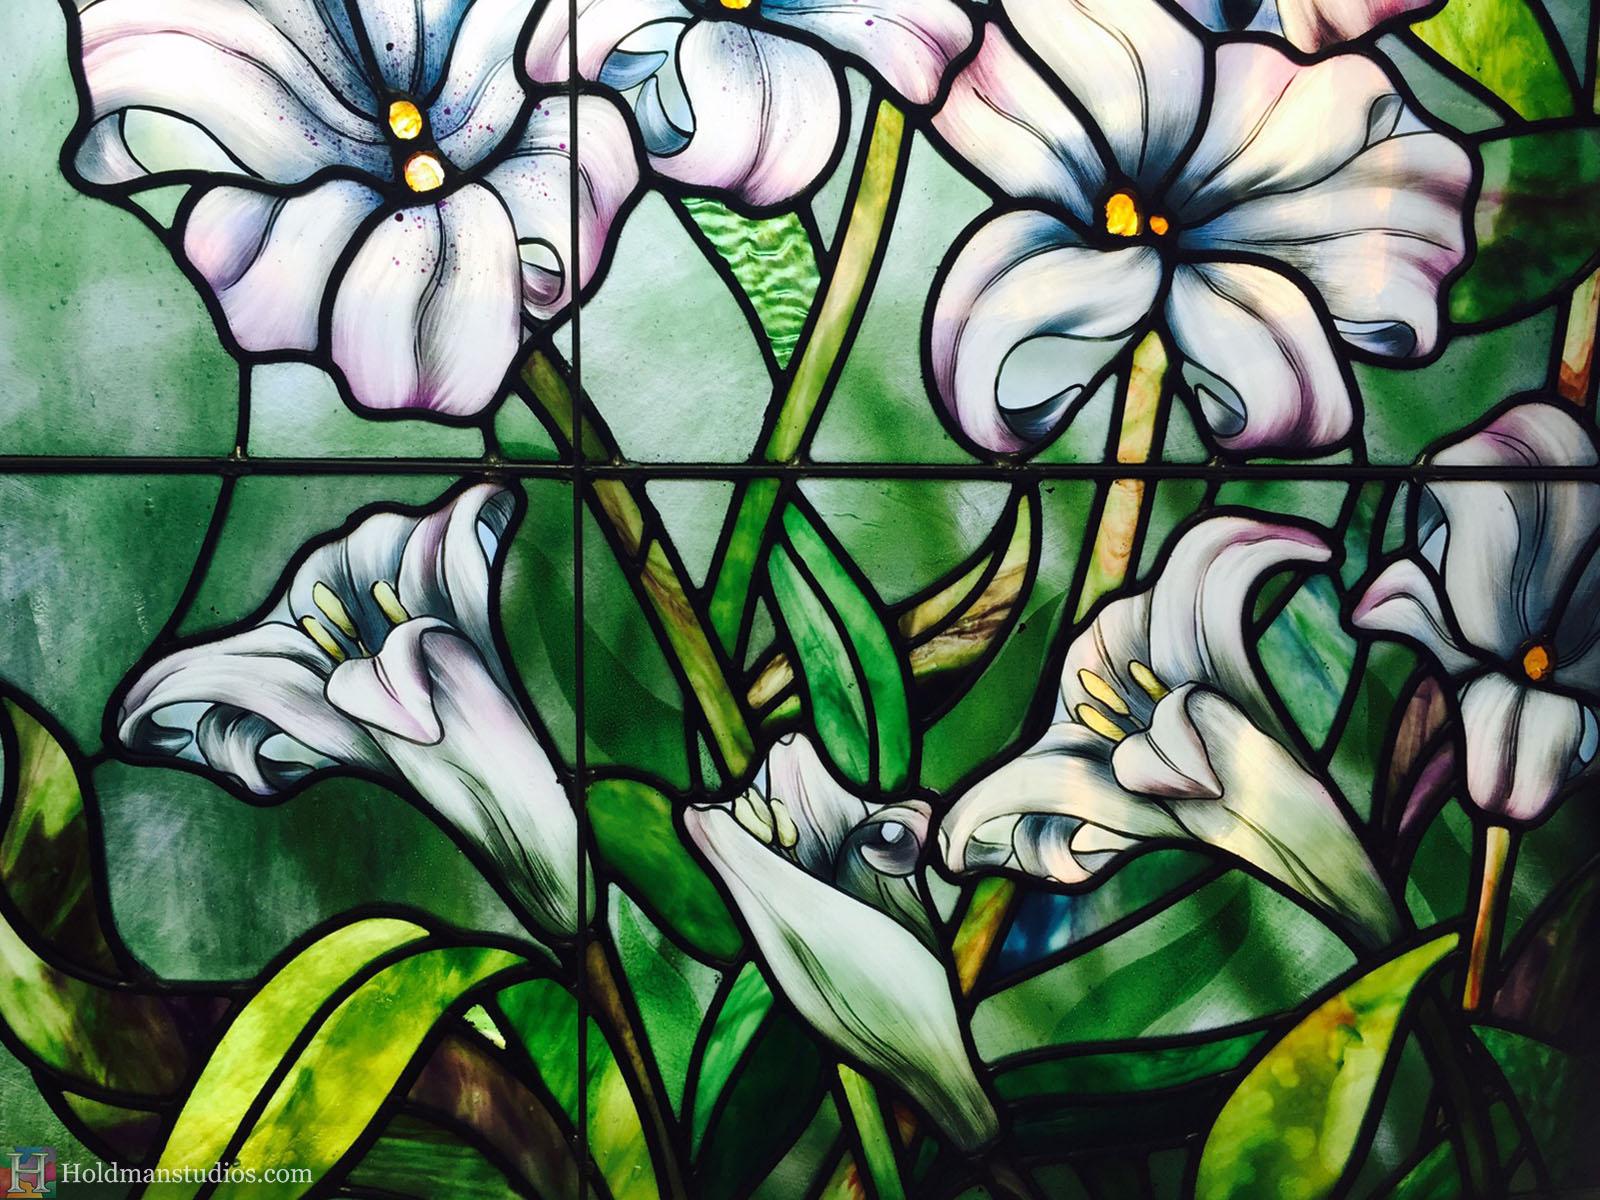 Holdman-Studios-Stained-Glass-Paris-LDS-Temple-Martagon-Lily-Flower-Window-Crop.jpg